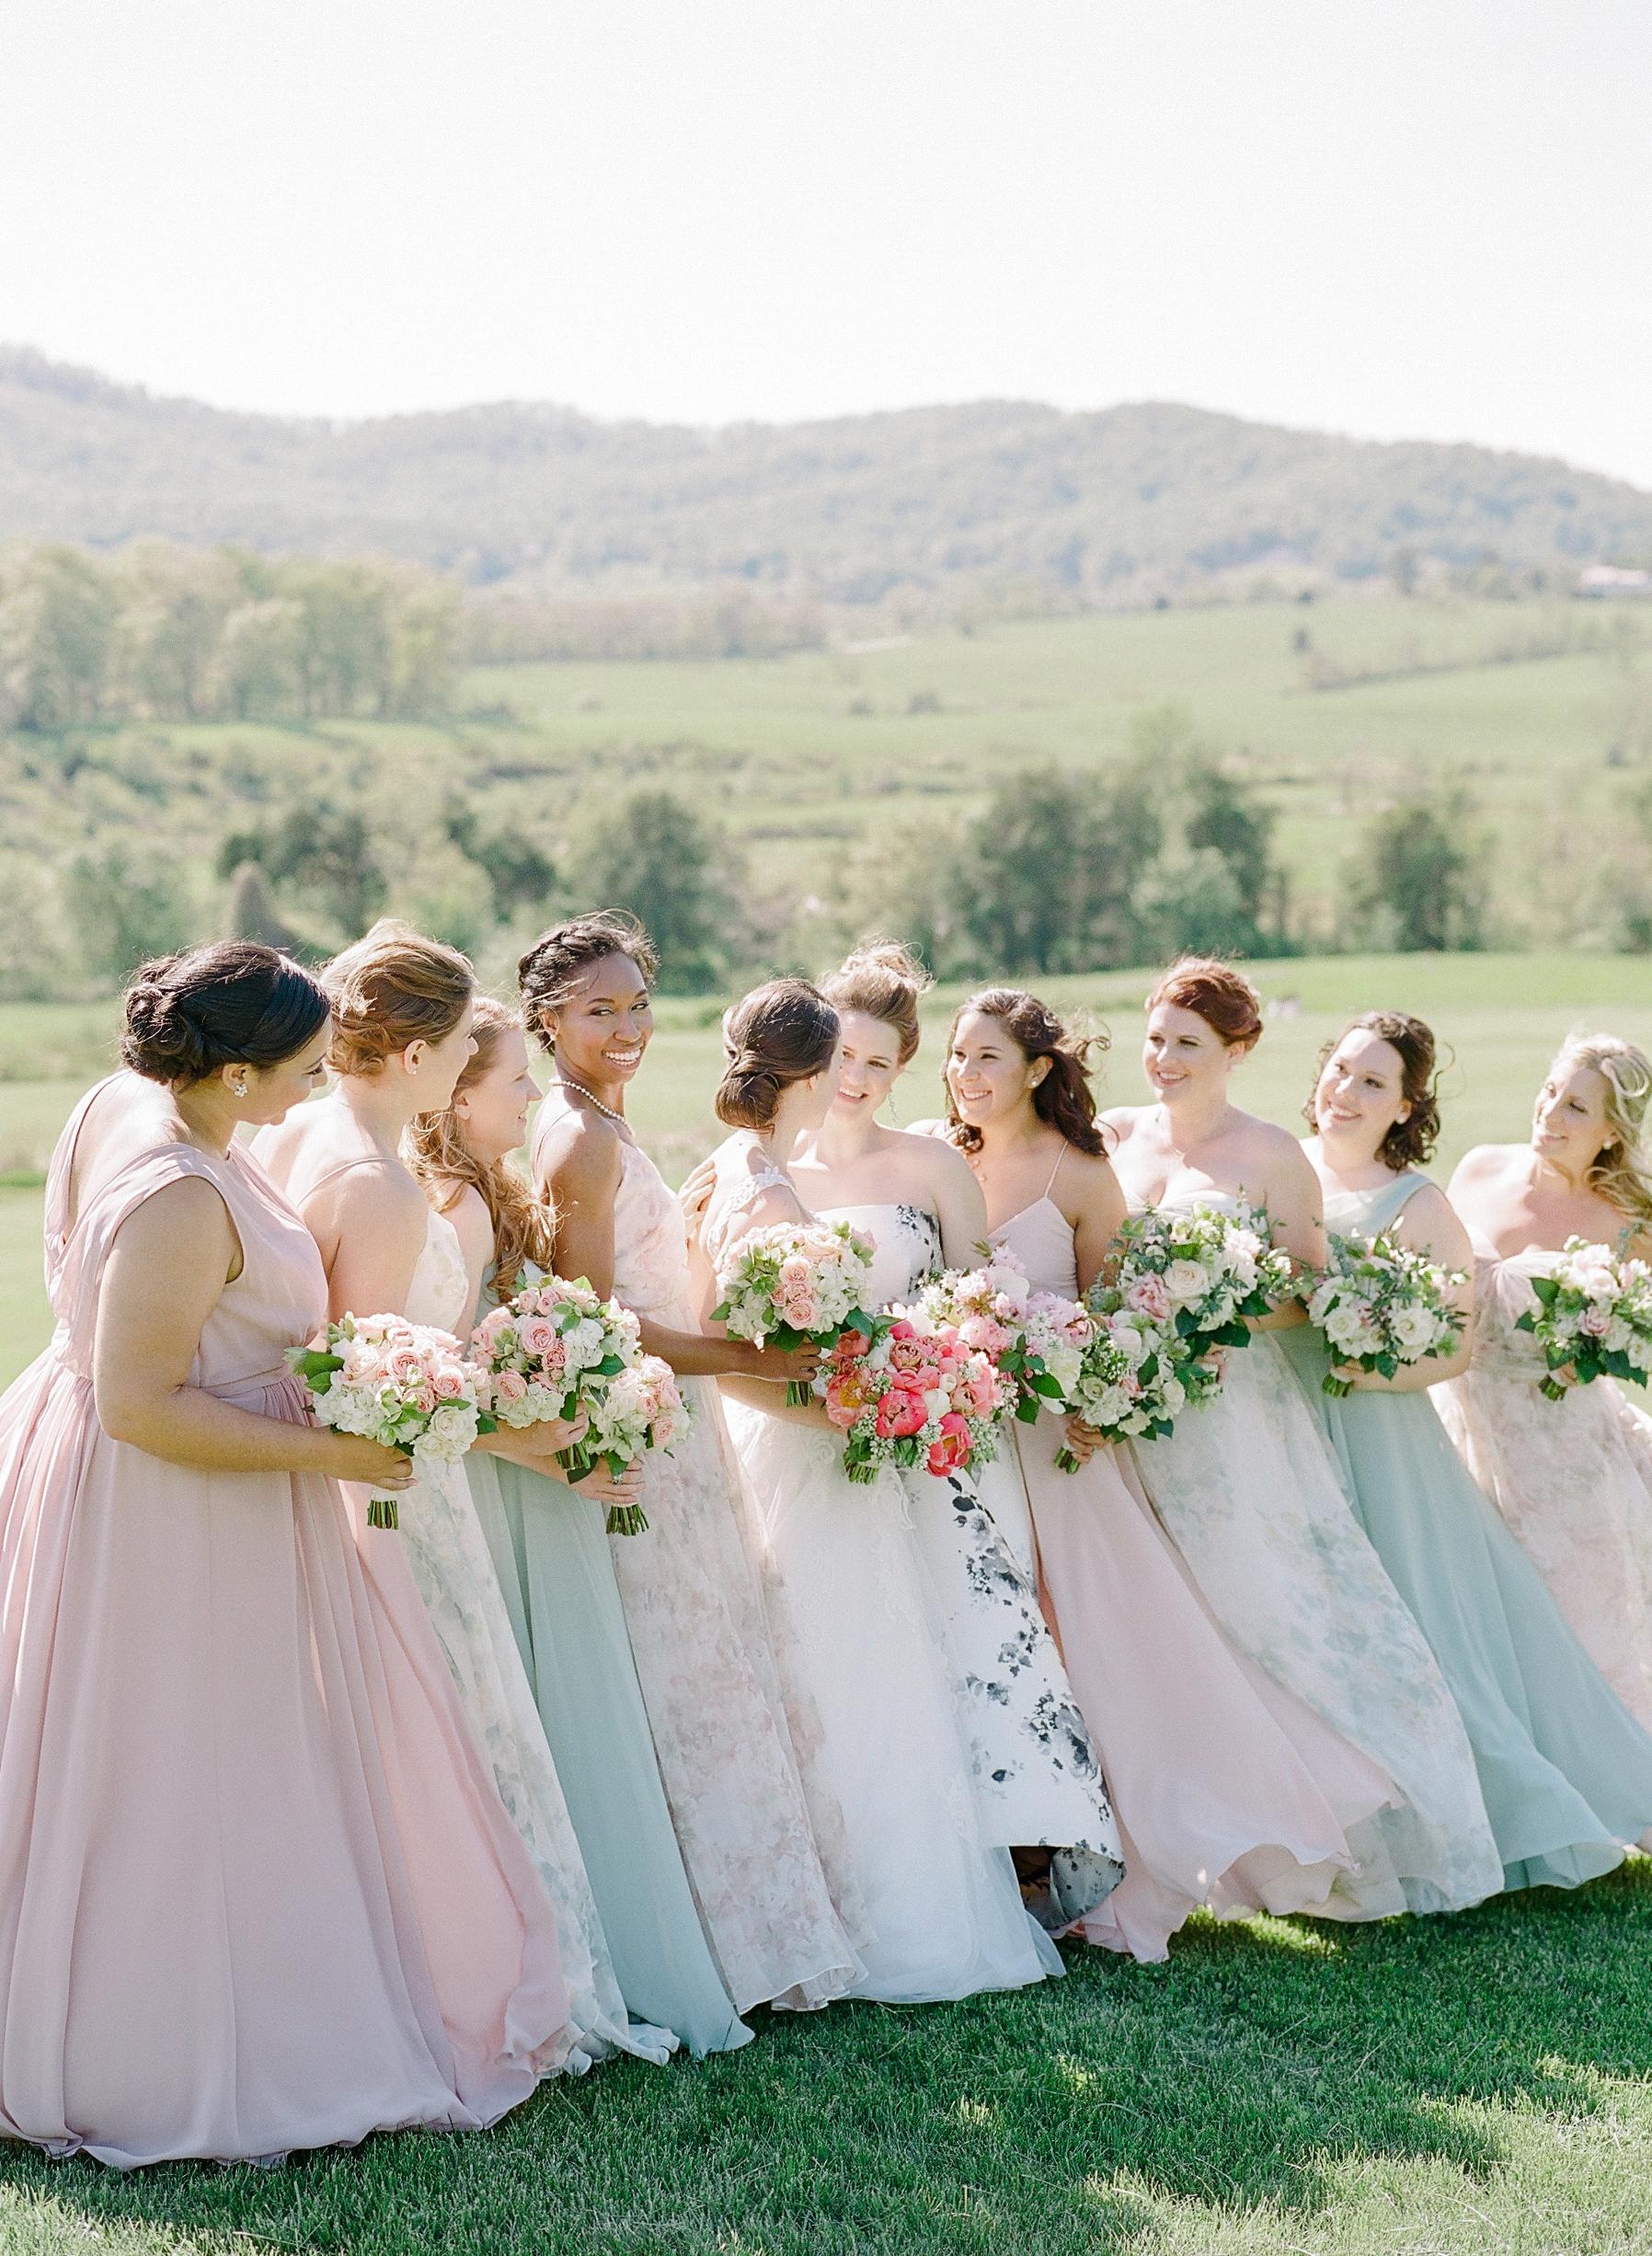 mechelle julia wedding bridesmaids and brides